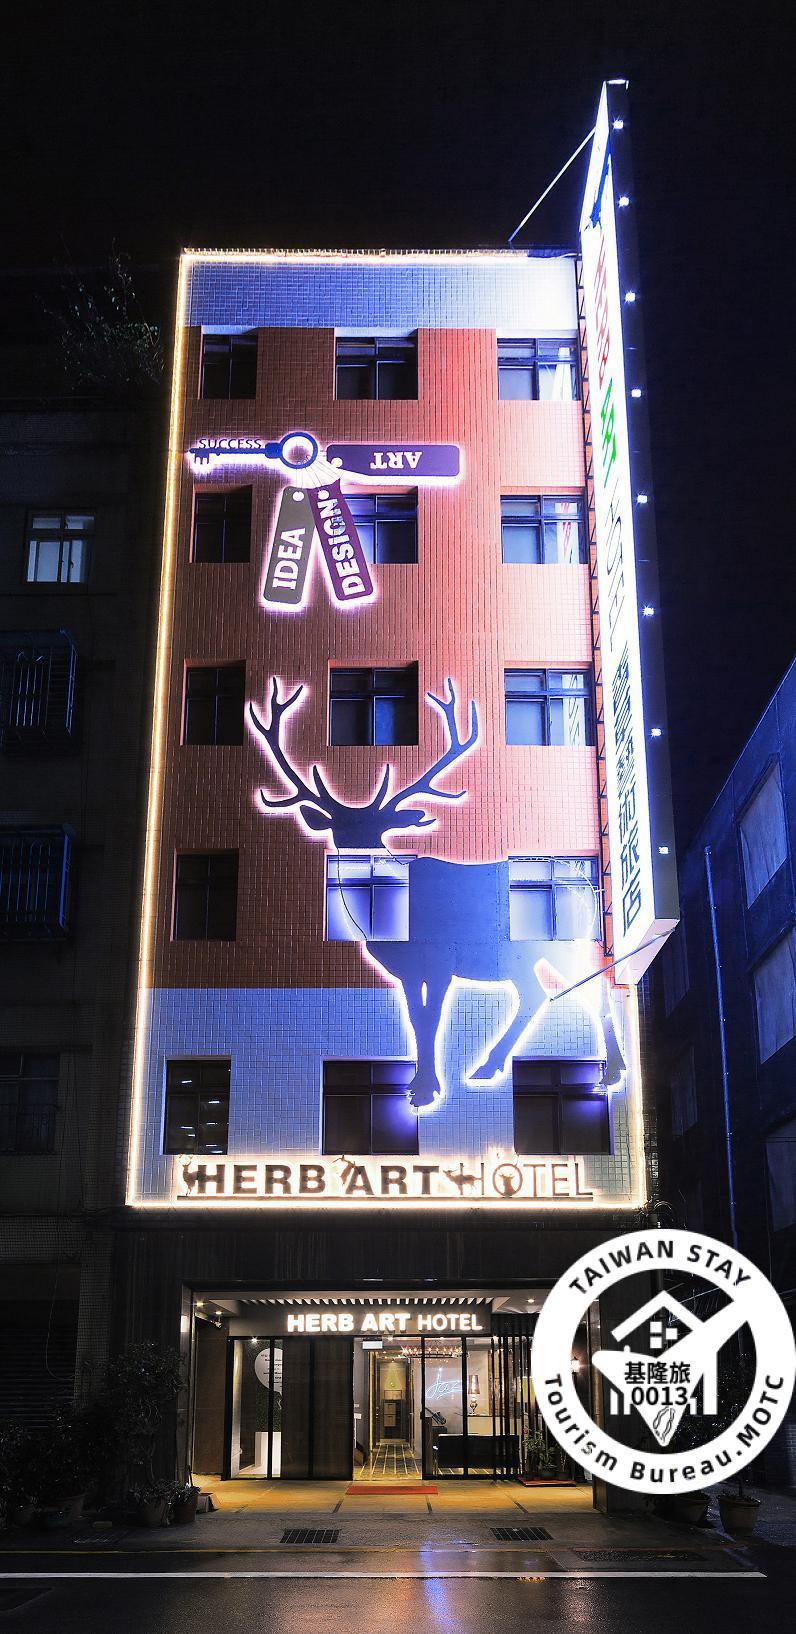 Hreb Art Hotel